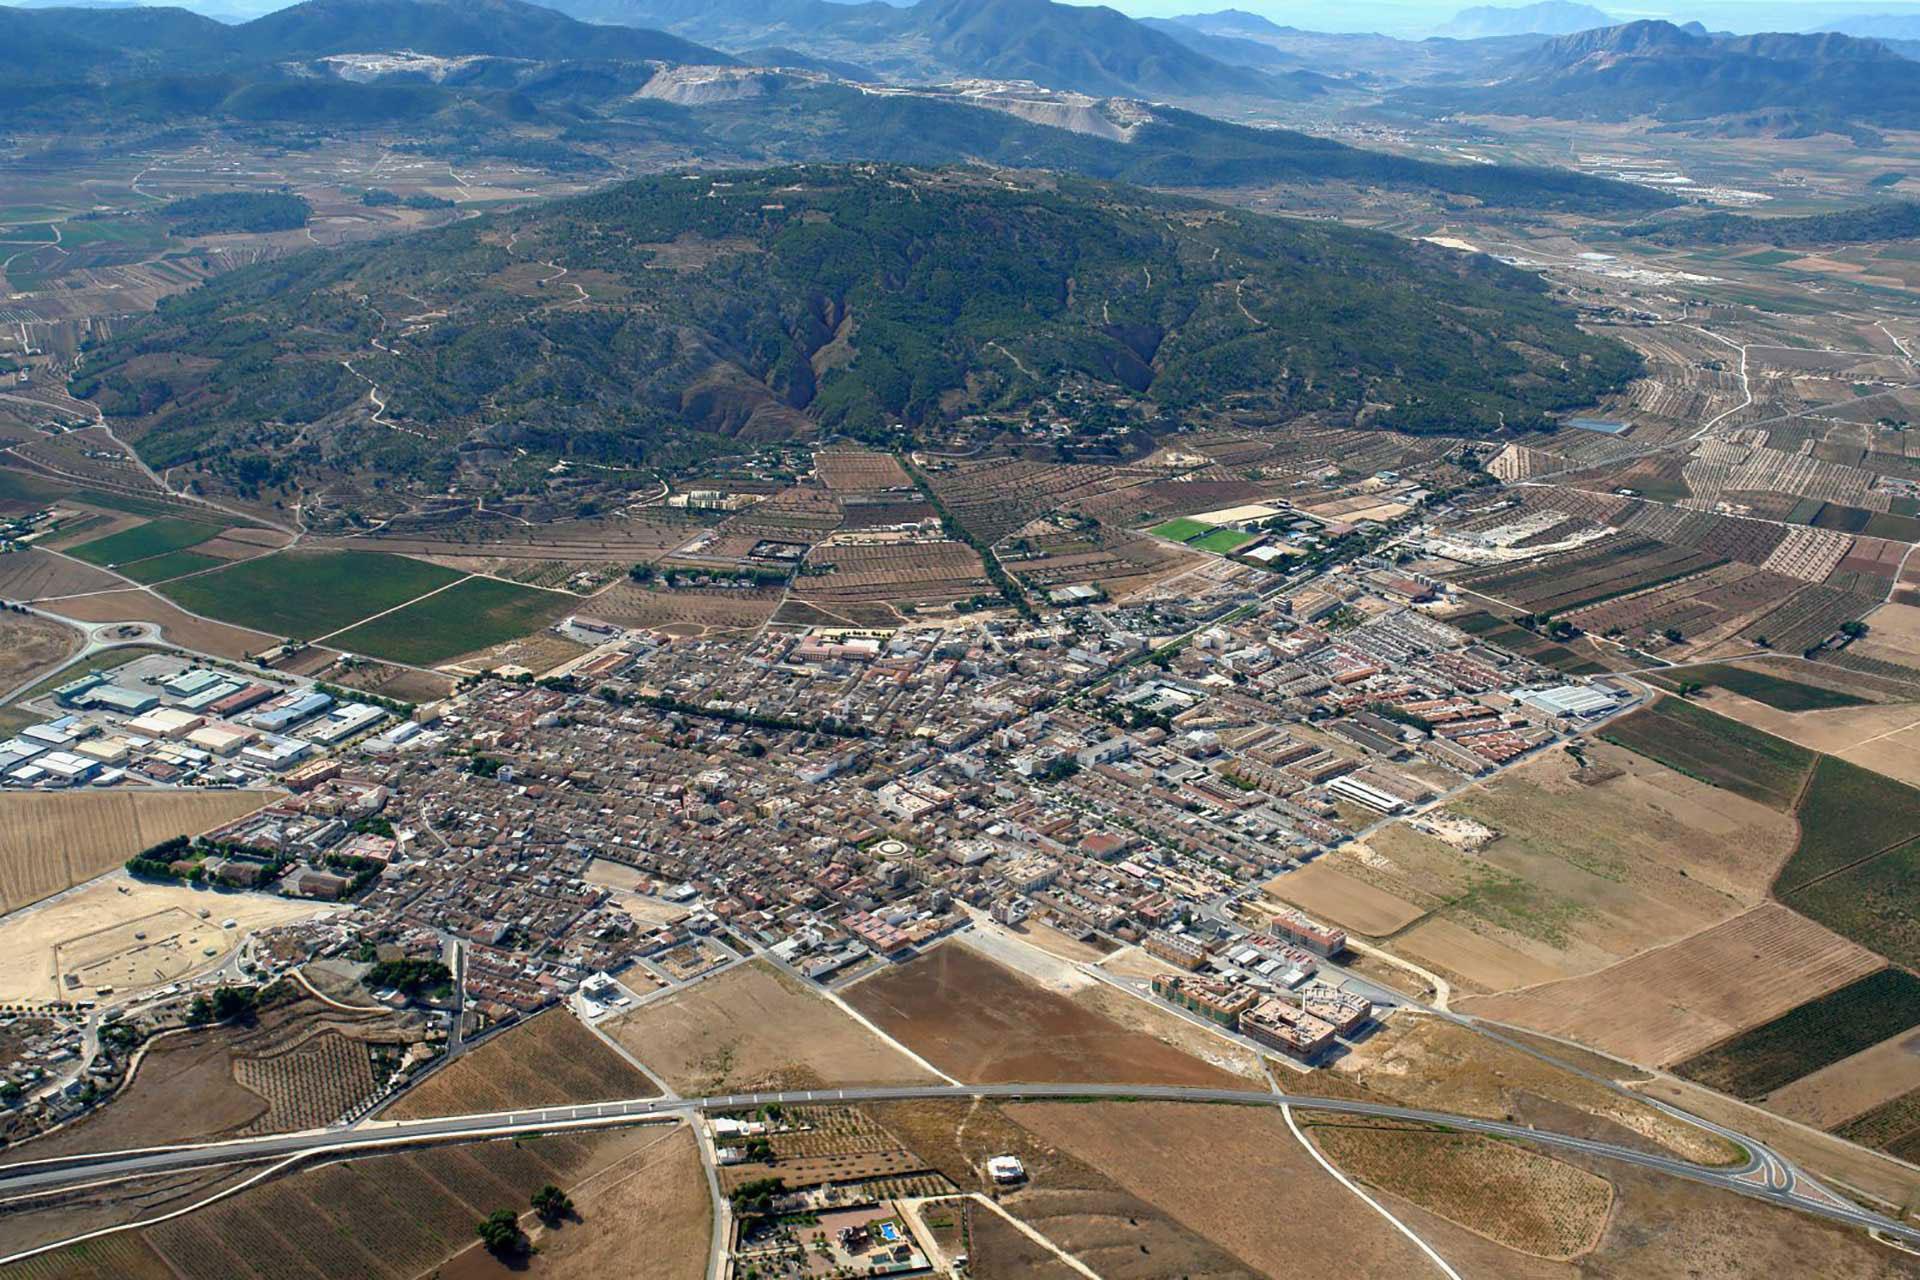 Municipio de Pinoso (Alicante)- Imagen: pinoso.org